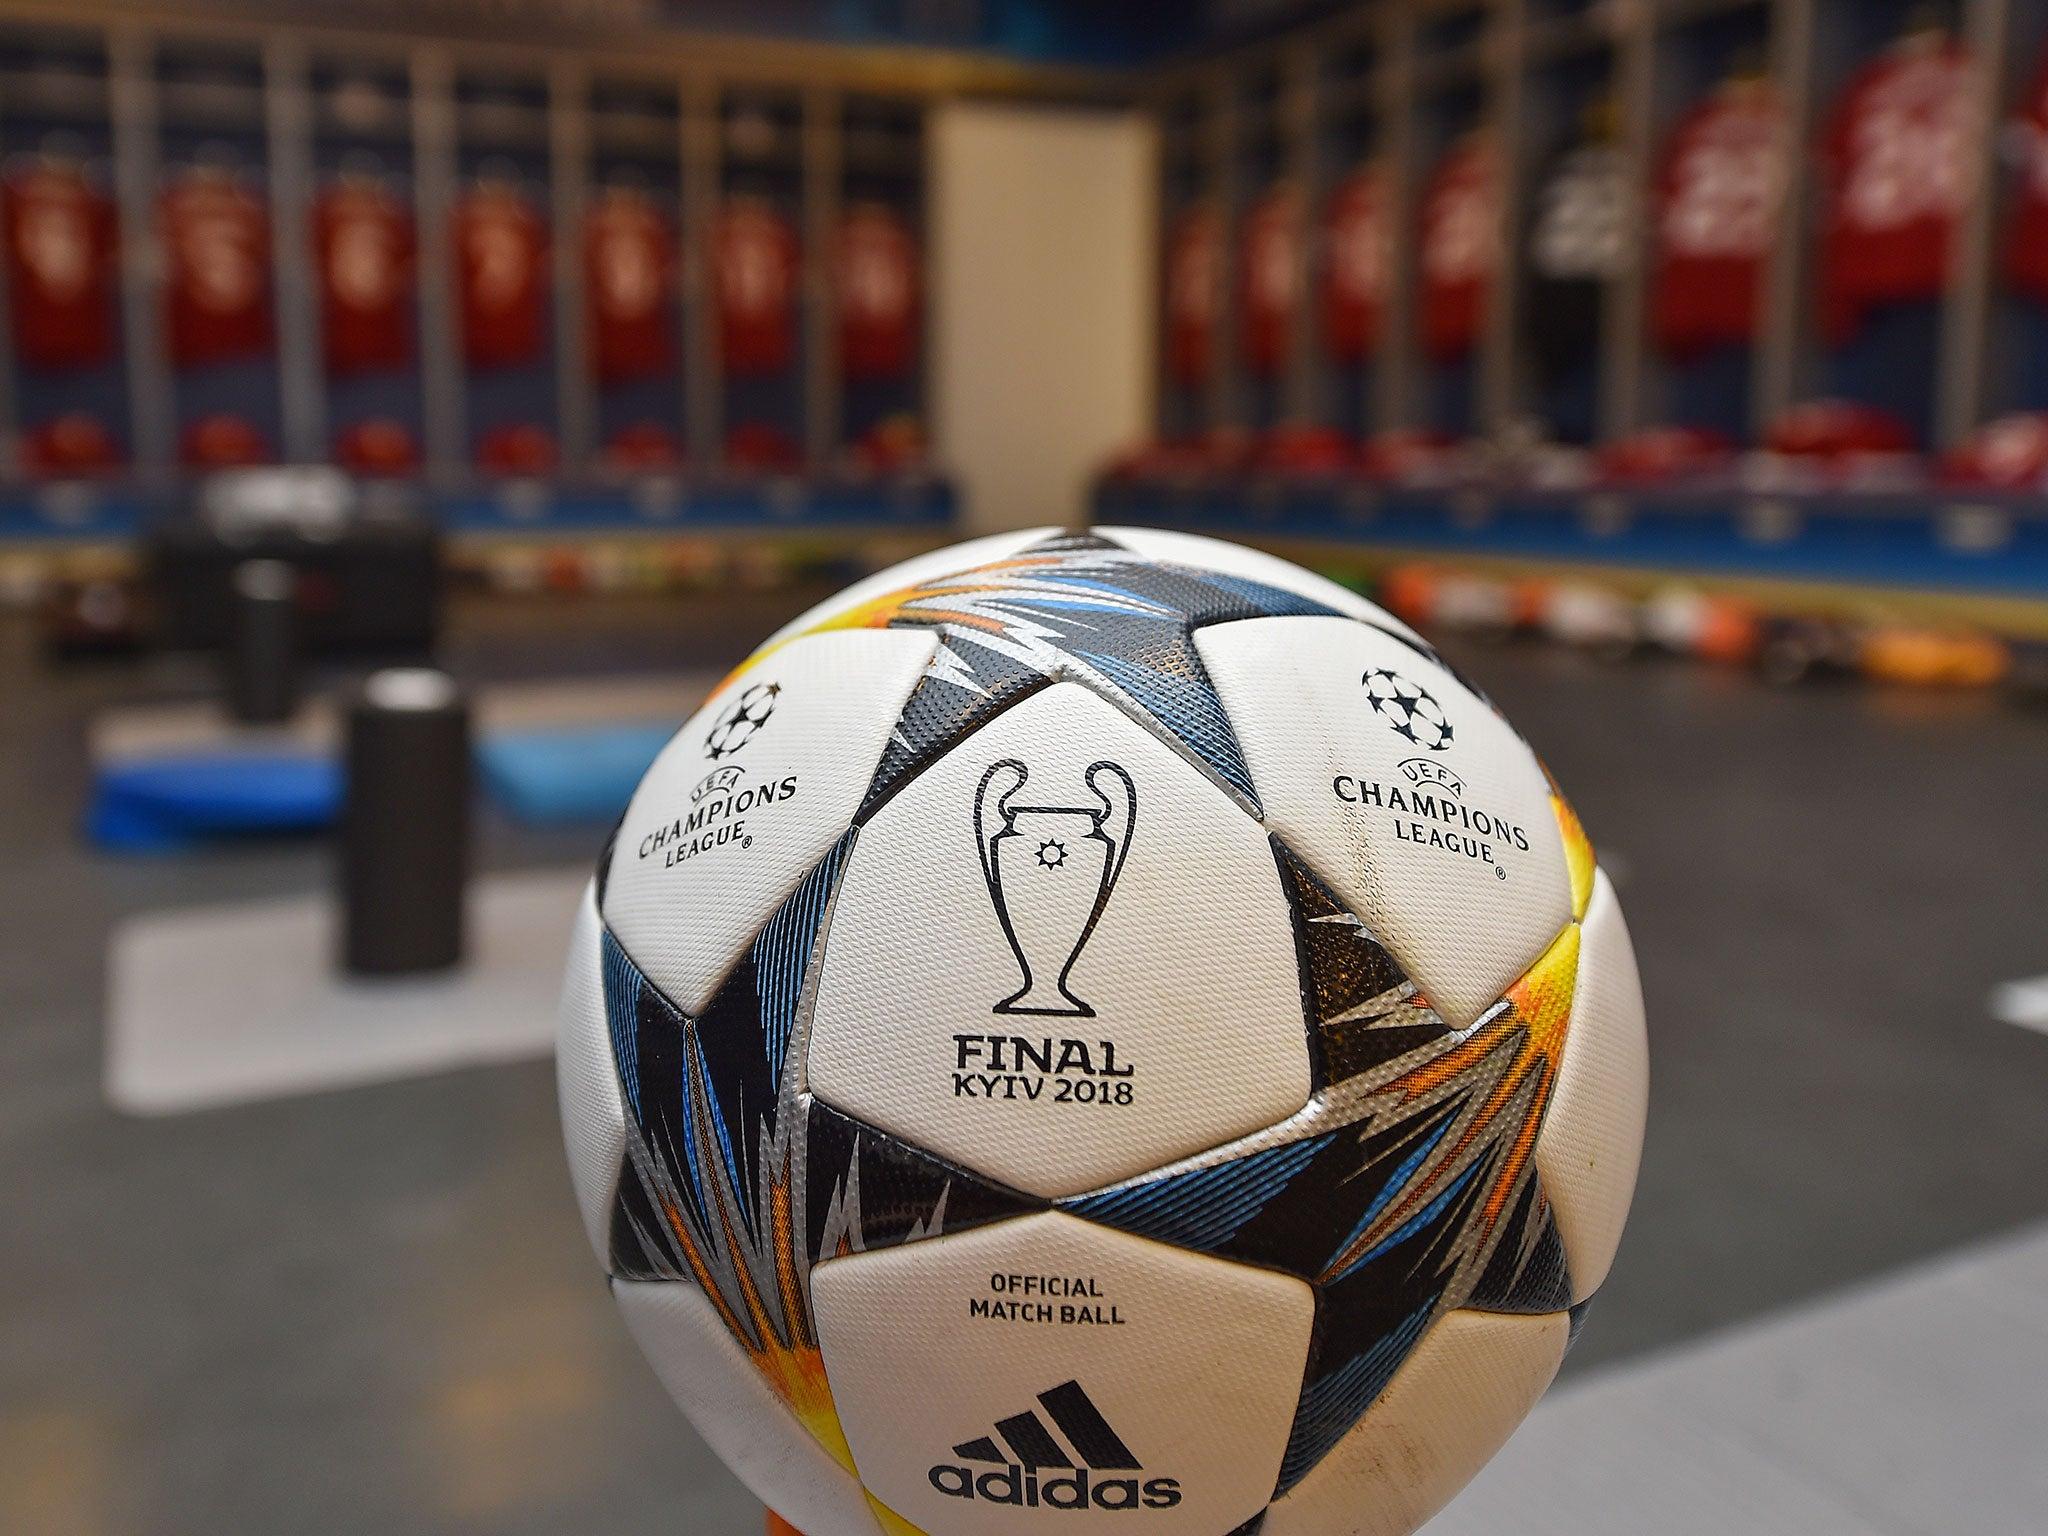 Liverpool team news: Jurgen Klopp makes selection for